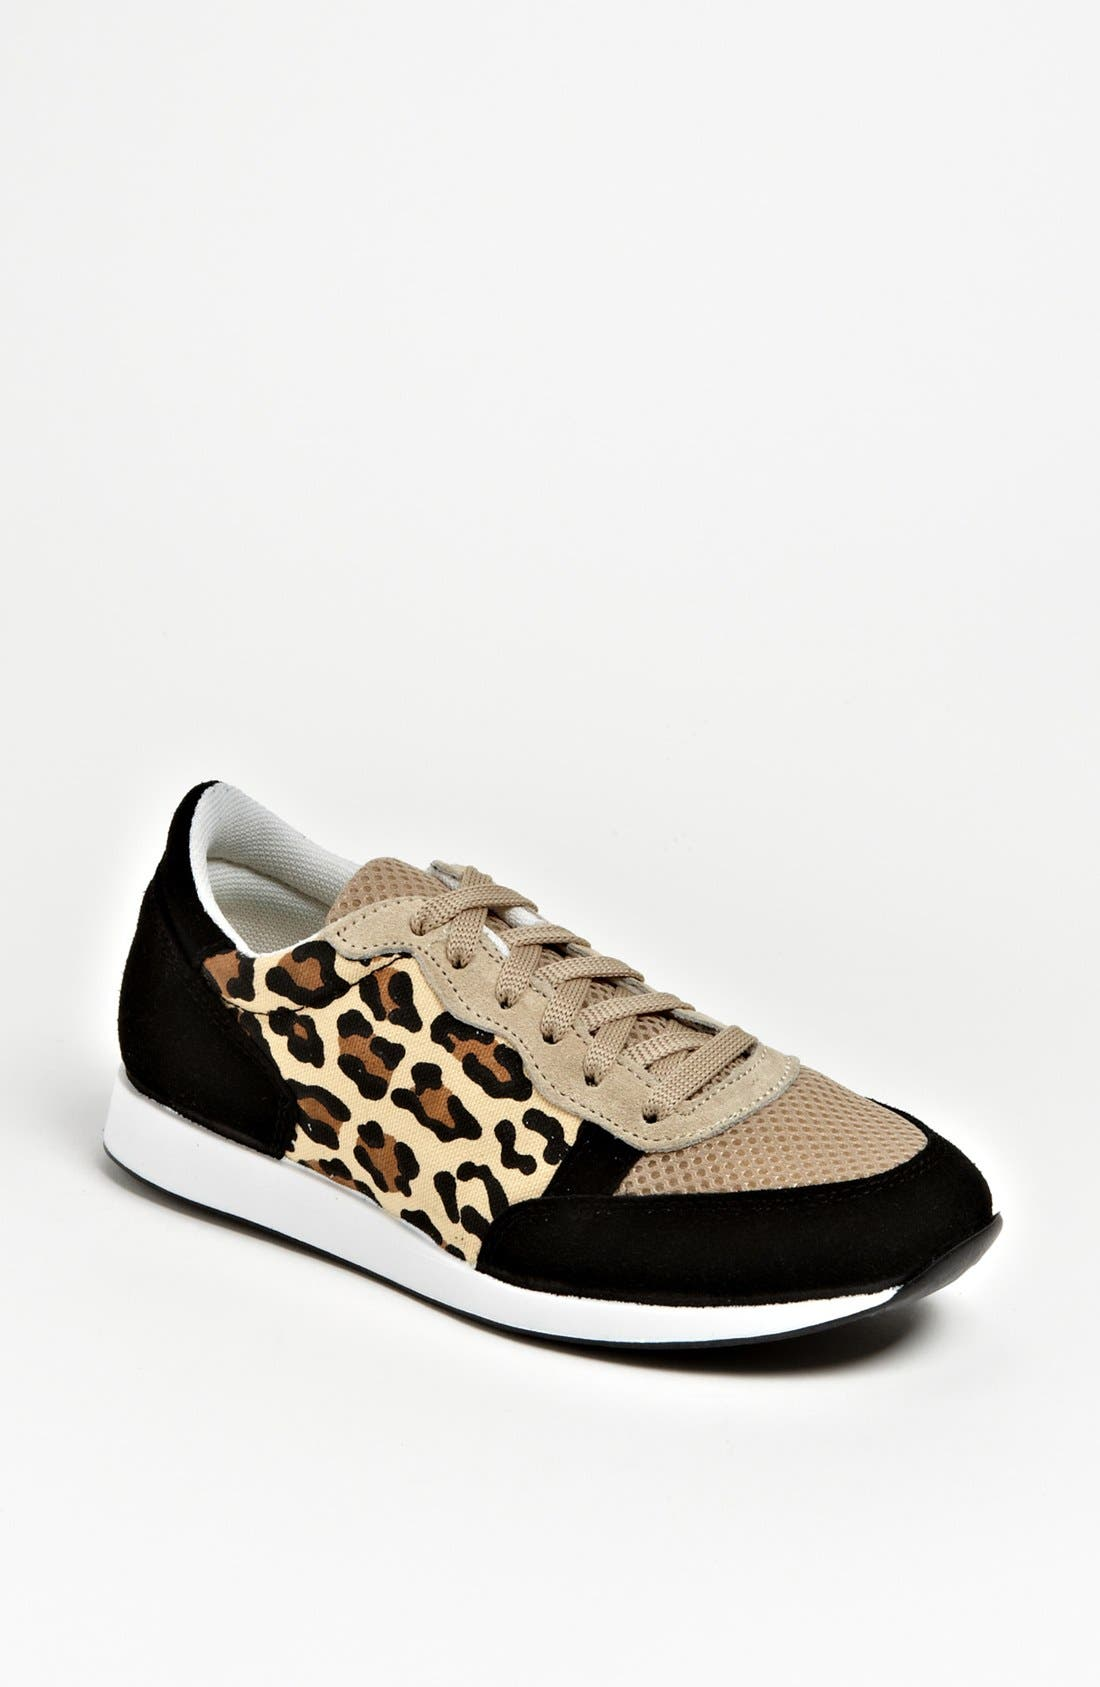 Main Image - Topshop 'Truffle' Sneaker